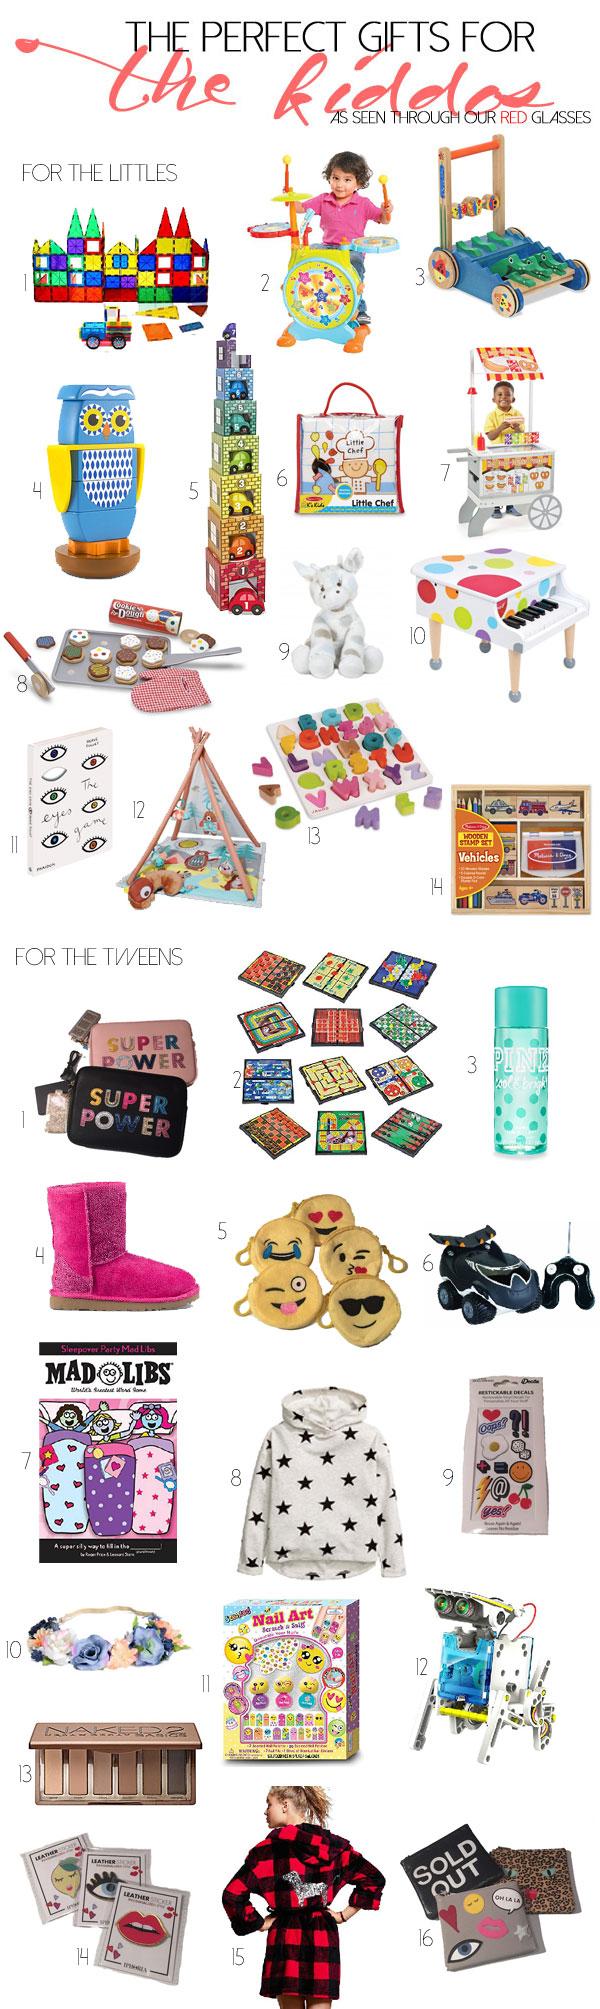 kiddos-gift-guide